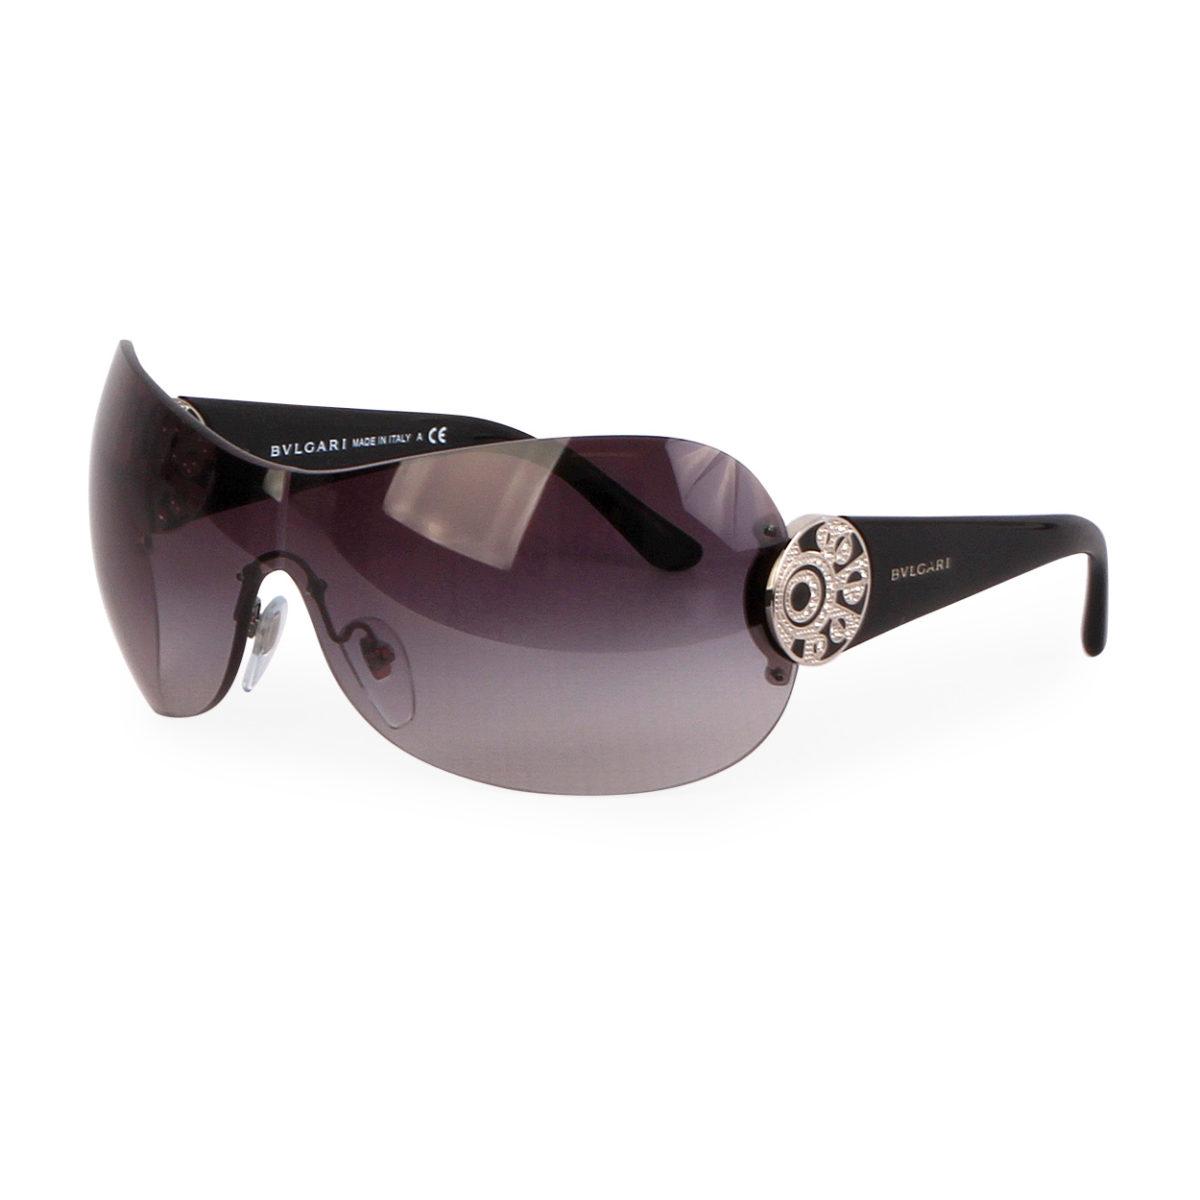 f73229d993ce4 BVLGARI Swarovski Crystal Sunglasses 6074 B Black